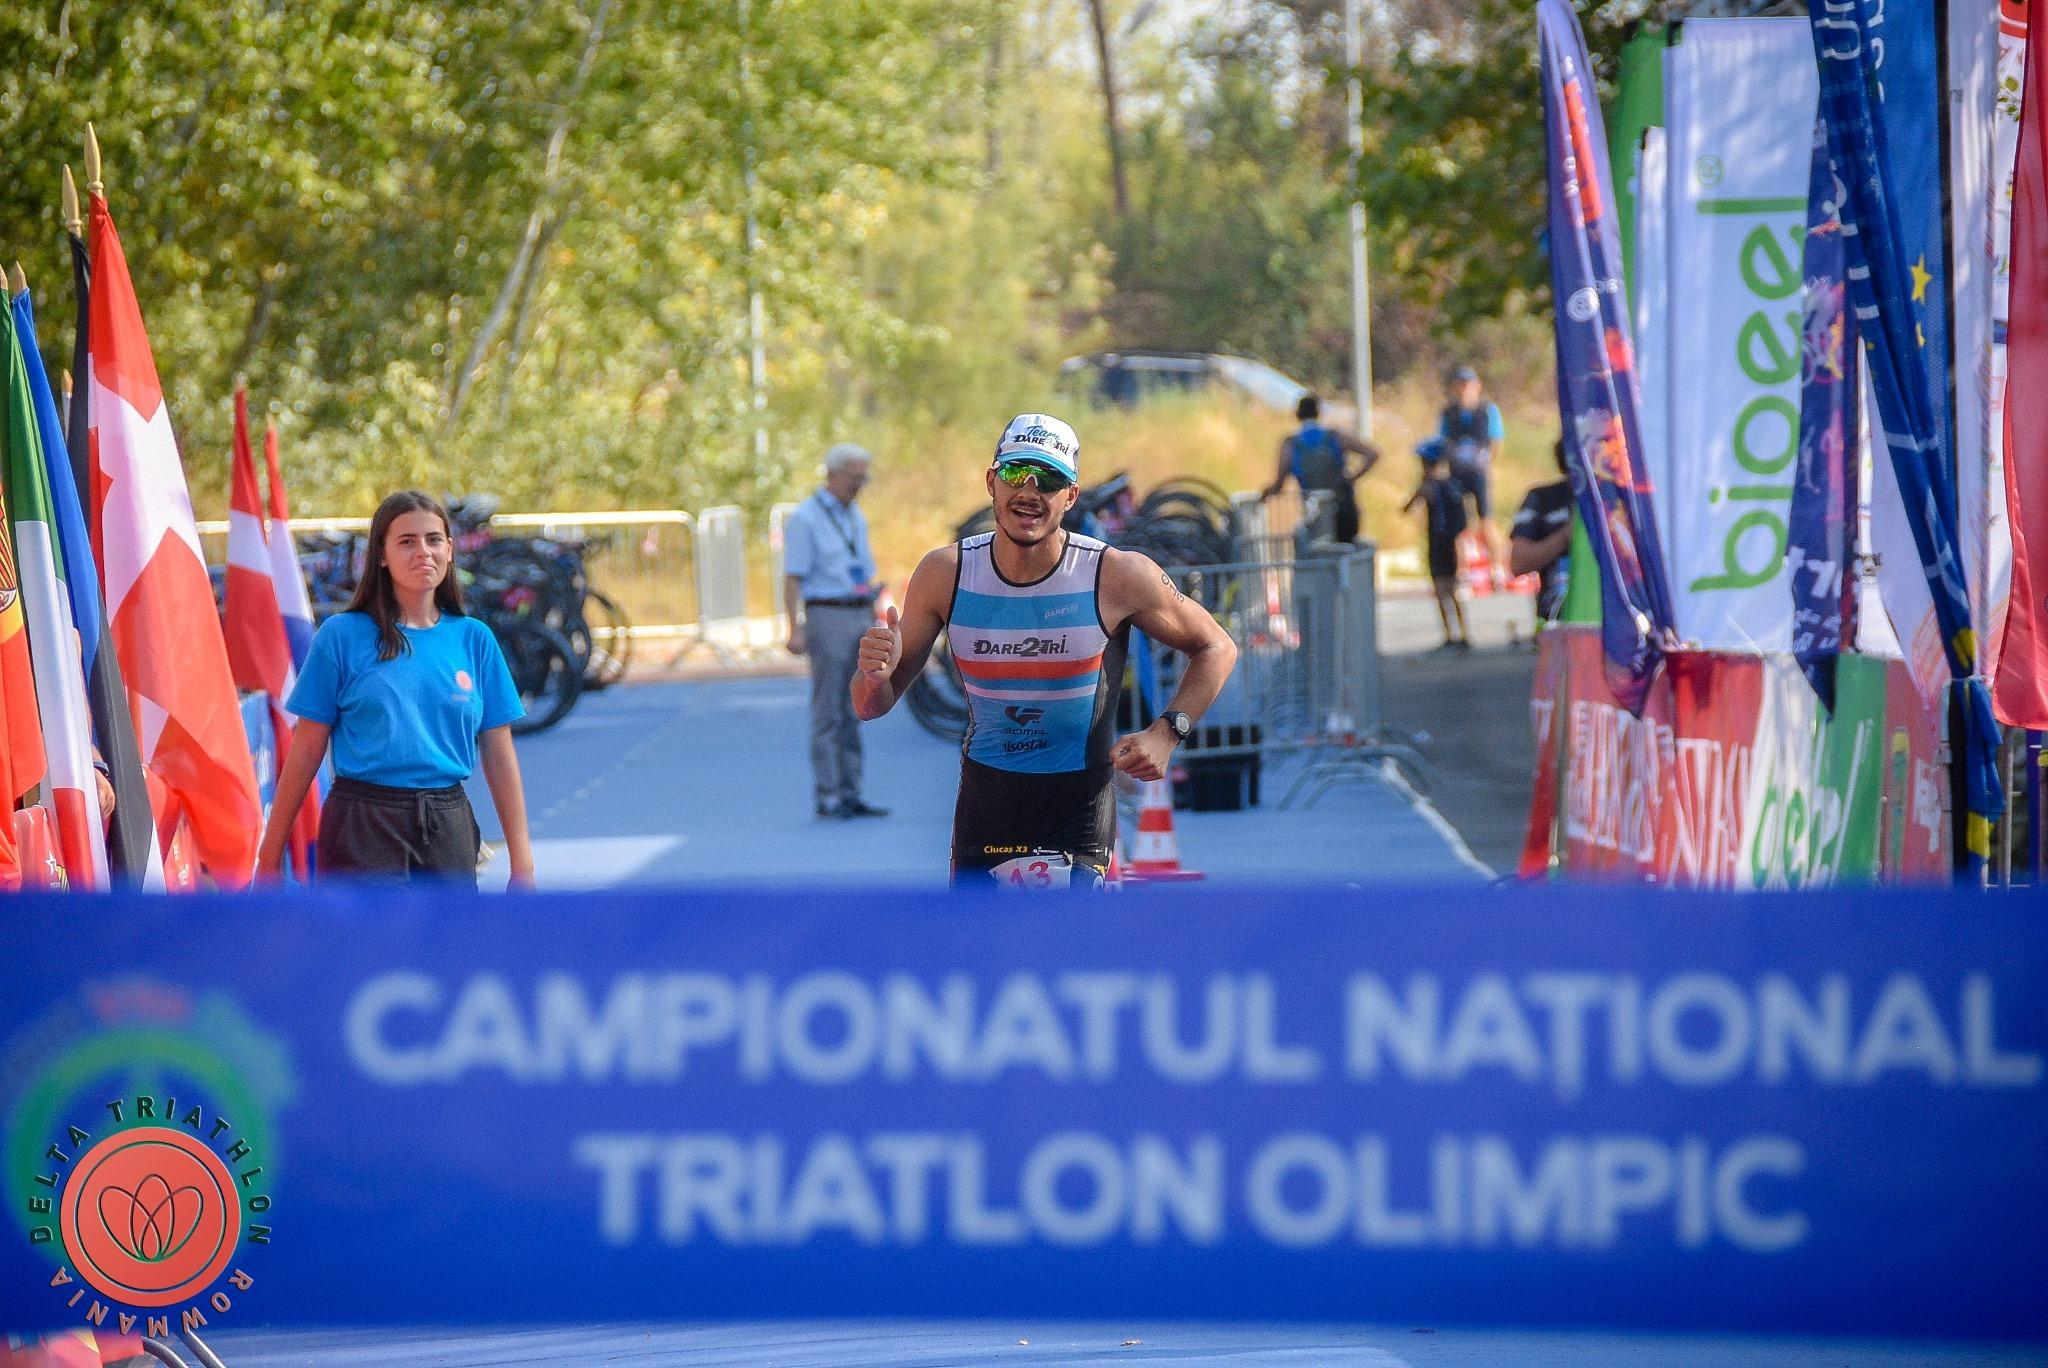 Alex Ion la cativa metri de titlul national la triatlon olimpic in 2019.